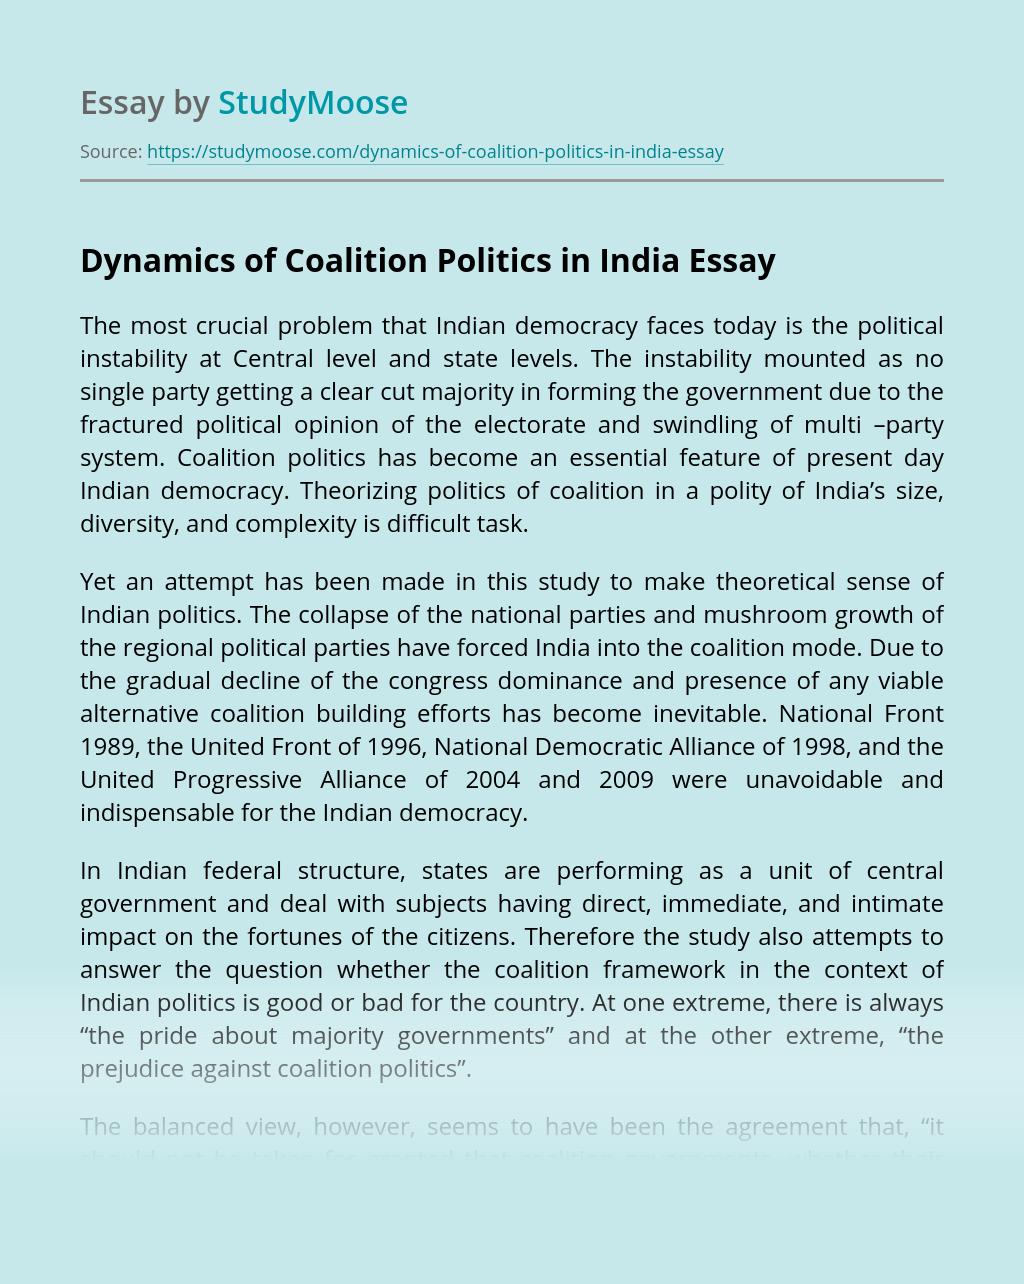 Dynamics of Coalition Politics in India